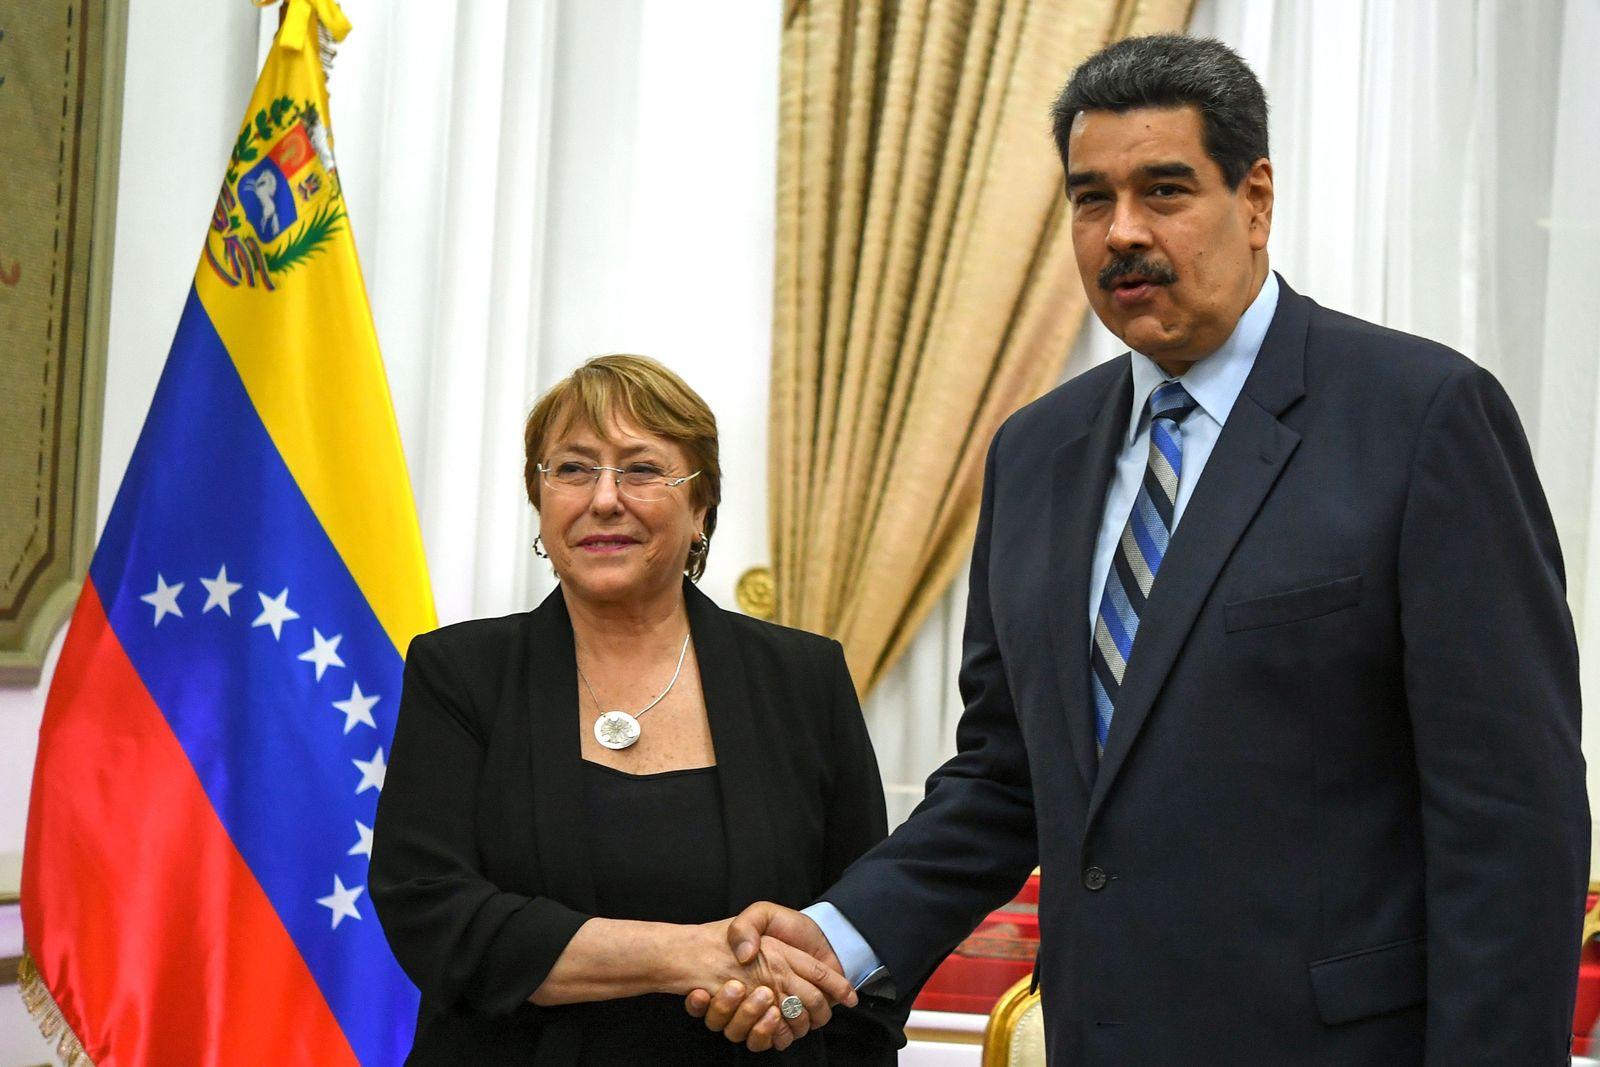 TOPSHOT-VENEZUELA-CRISIS-UN-MADURO-BACHELET